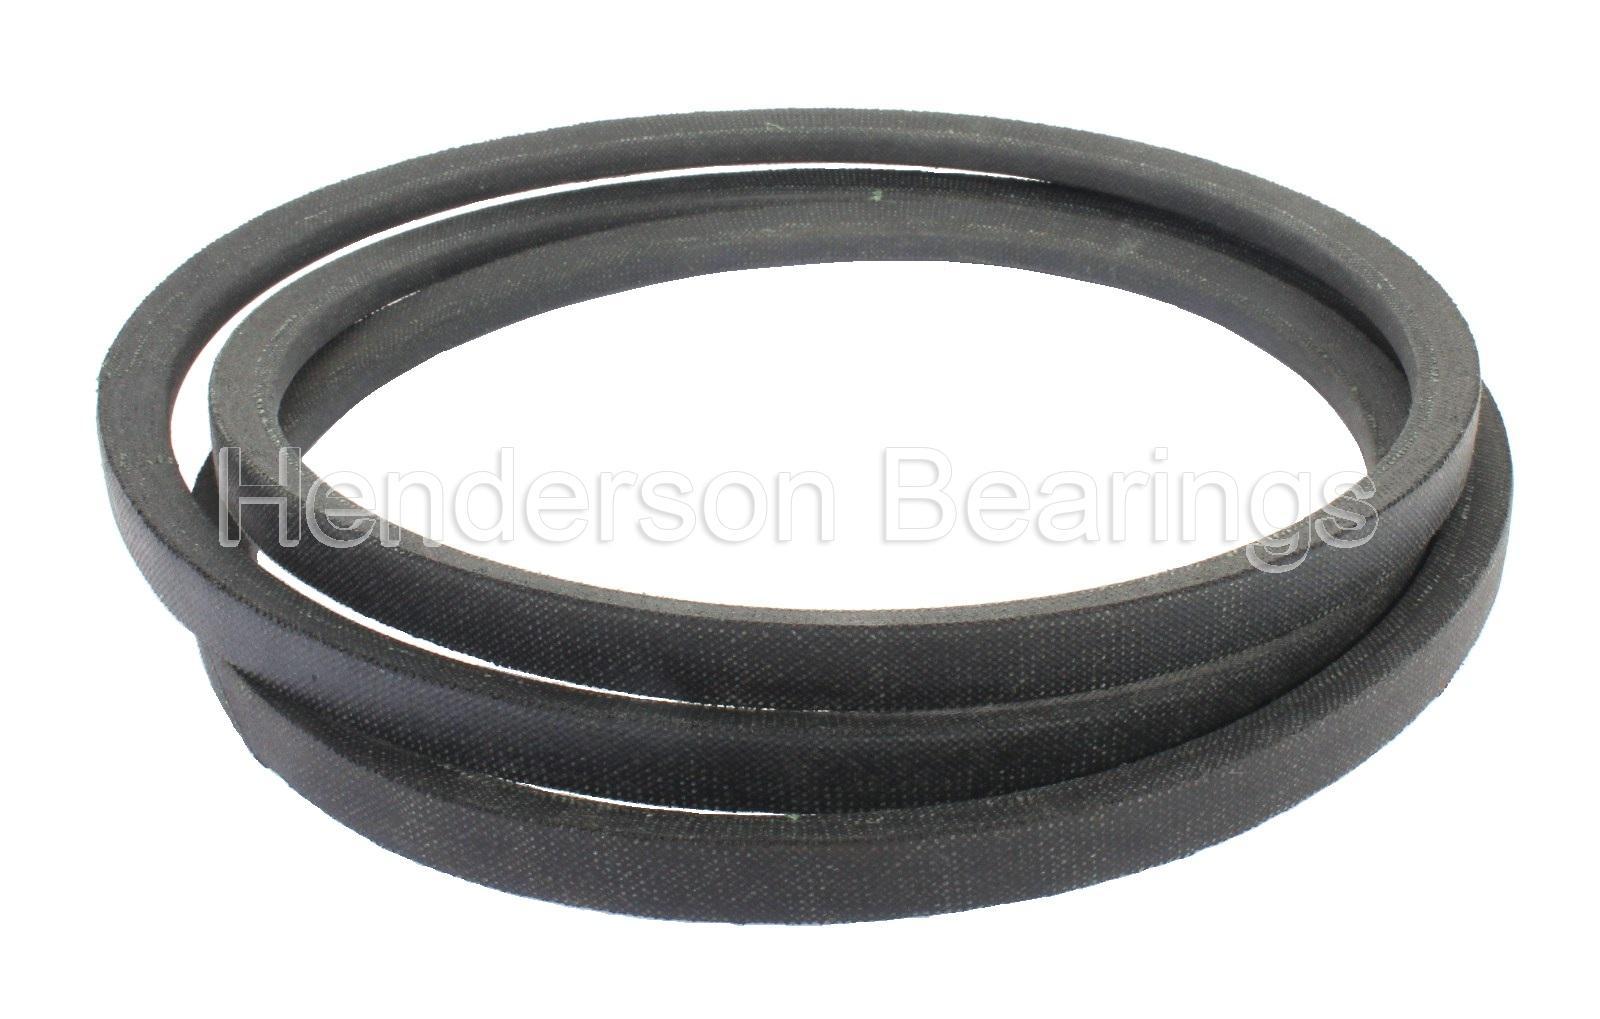 SPZ1087 Wedge Belt